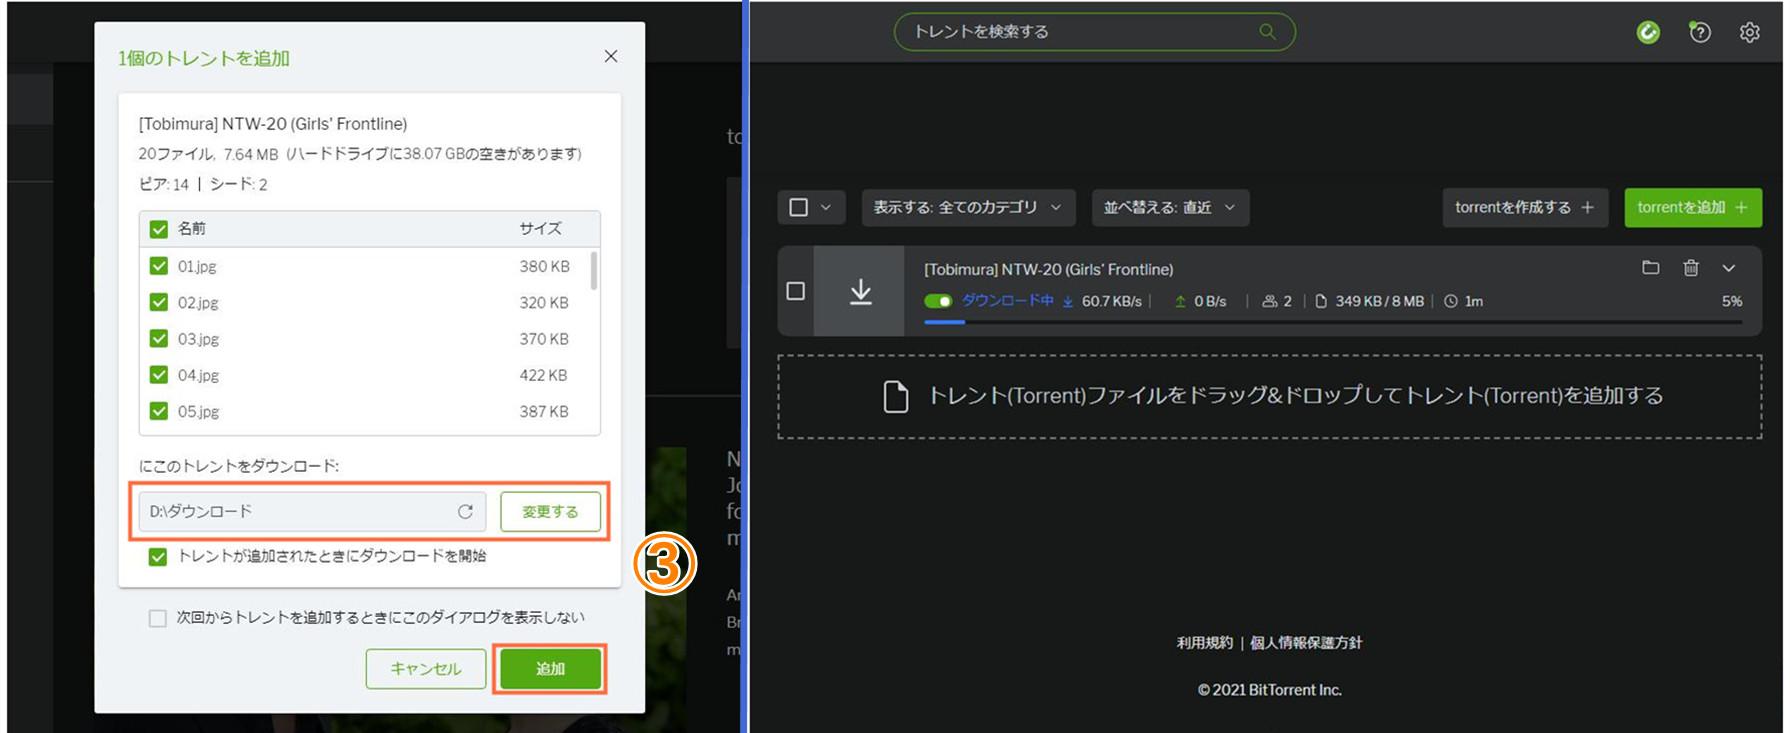 Torrentファイルを開く方法-2